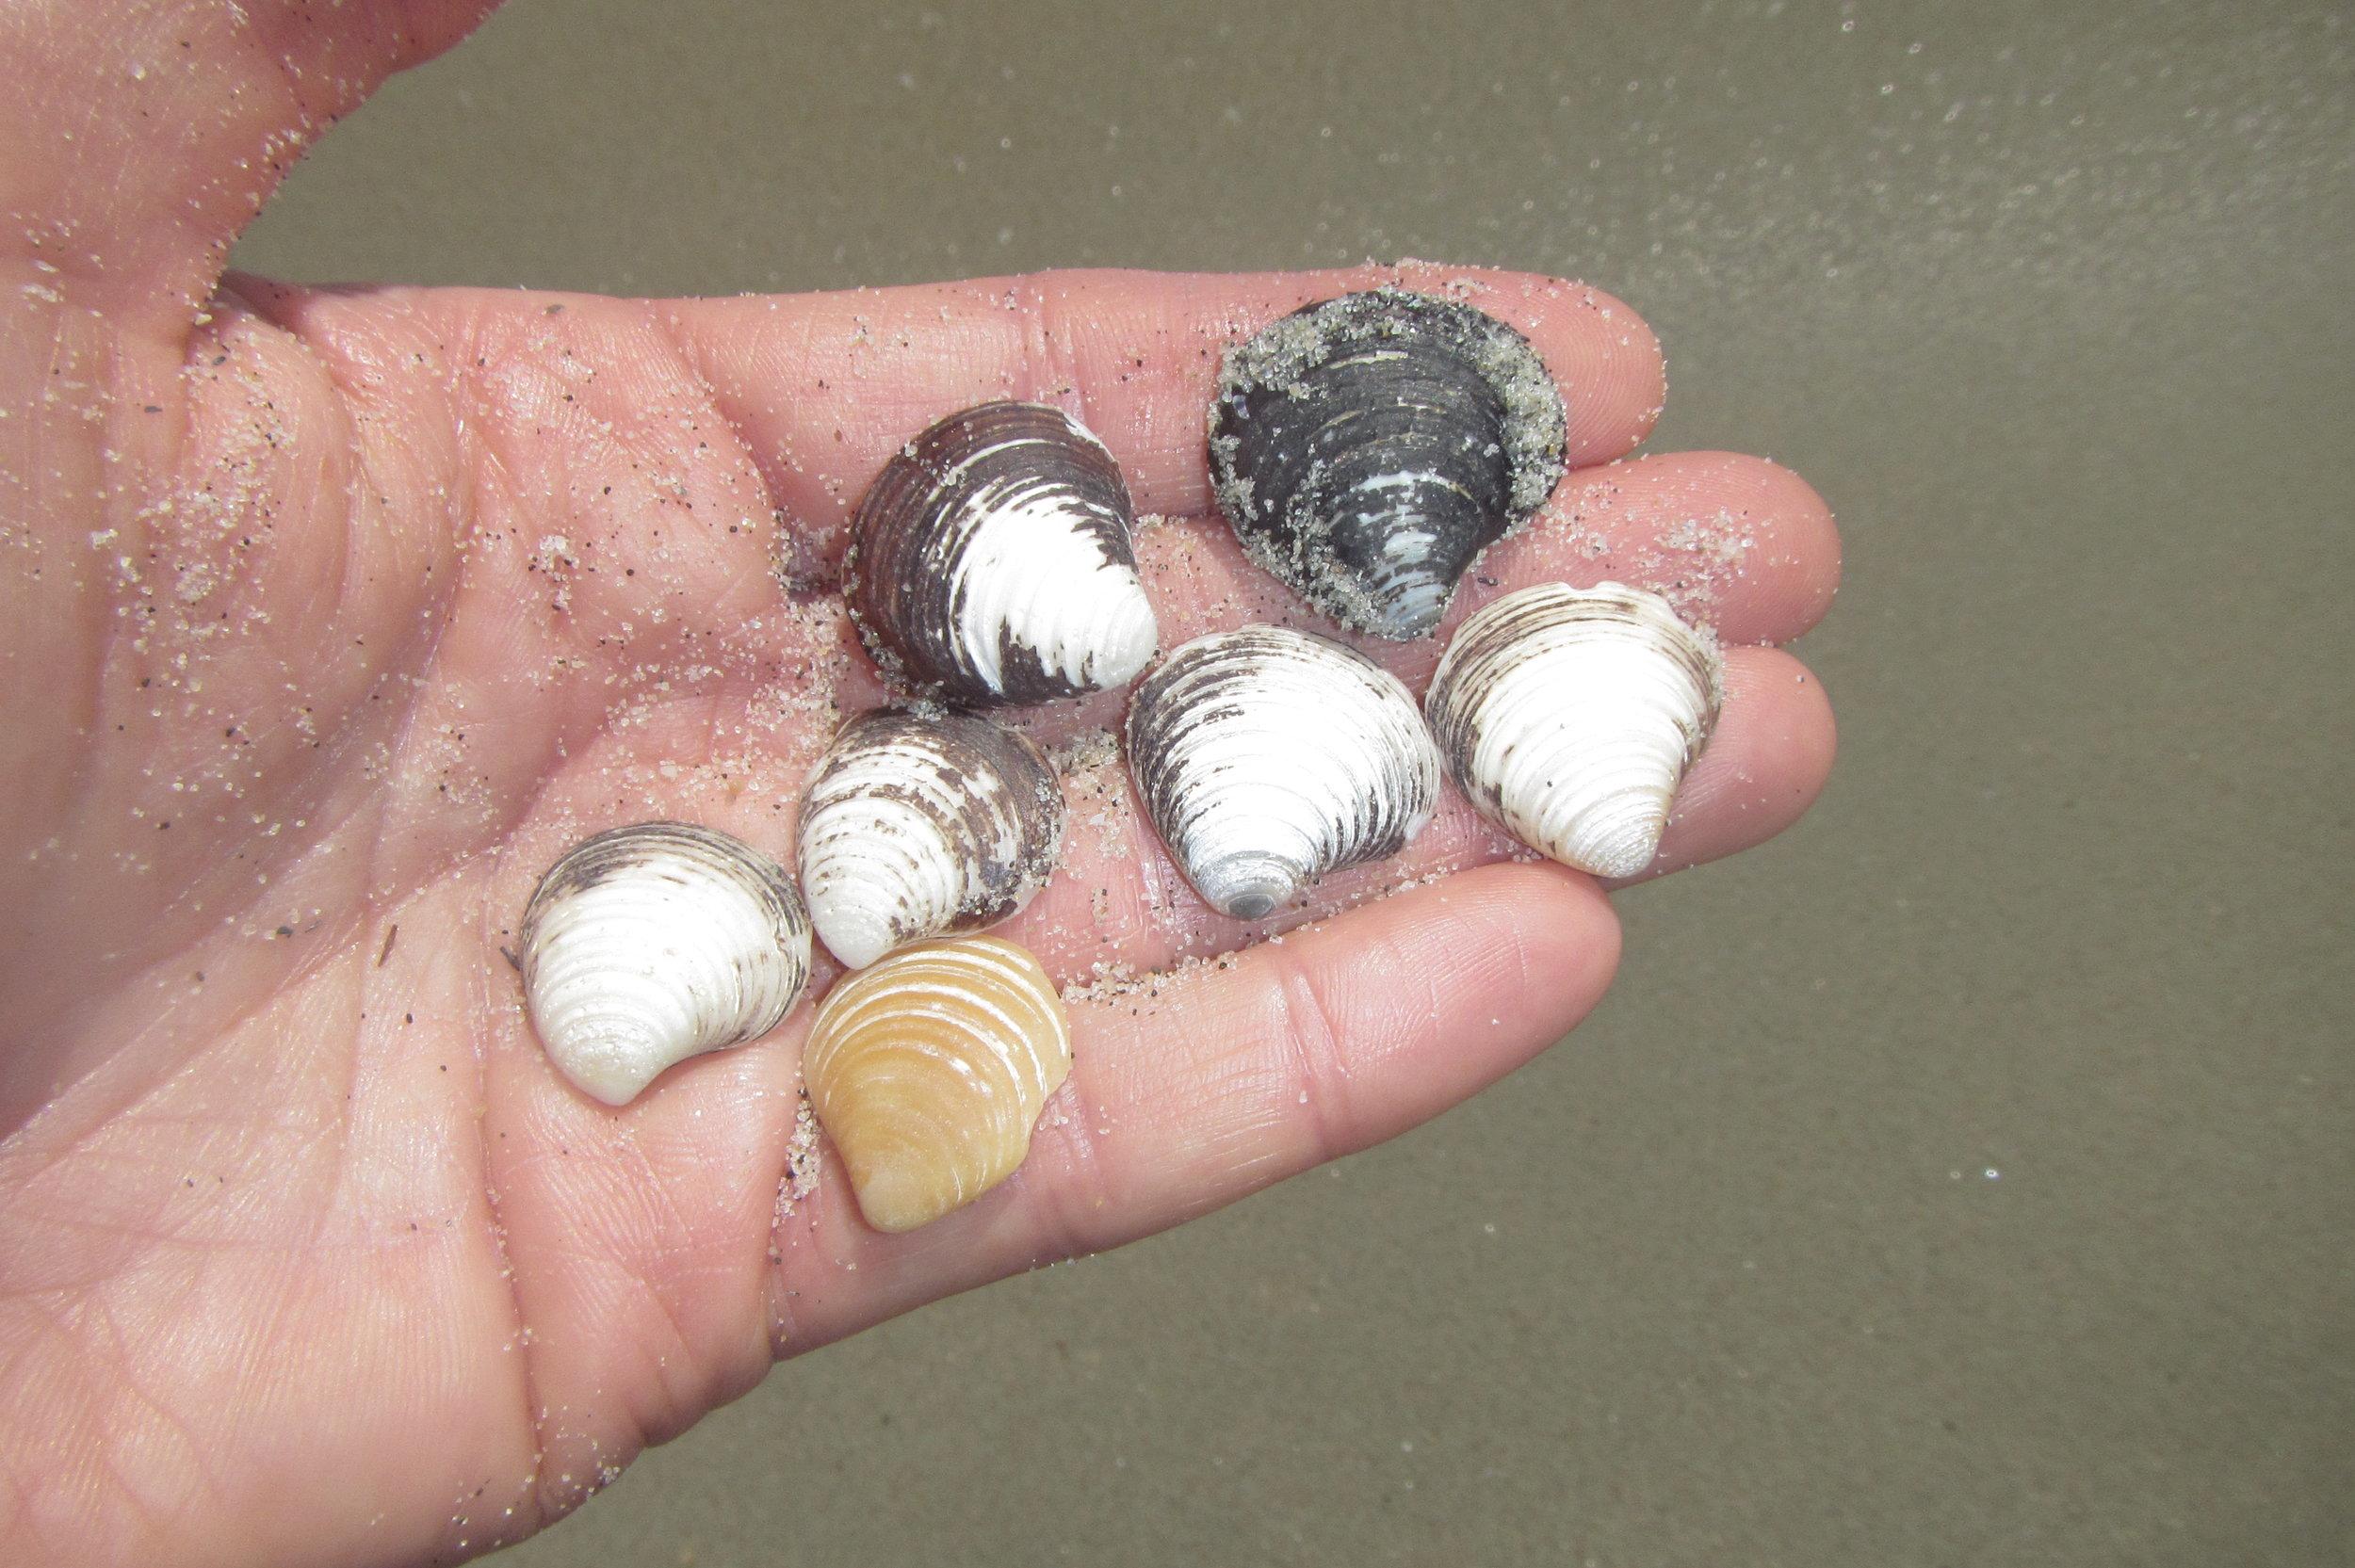 Chestnut astarte clam